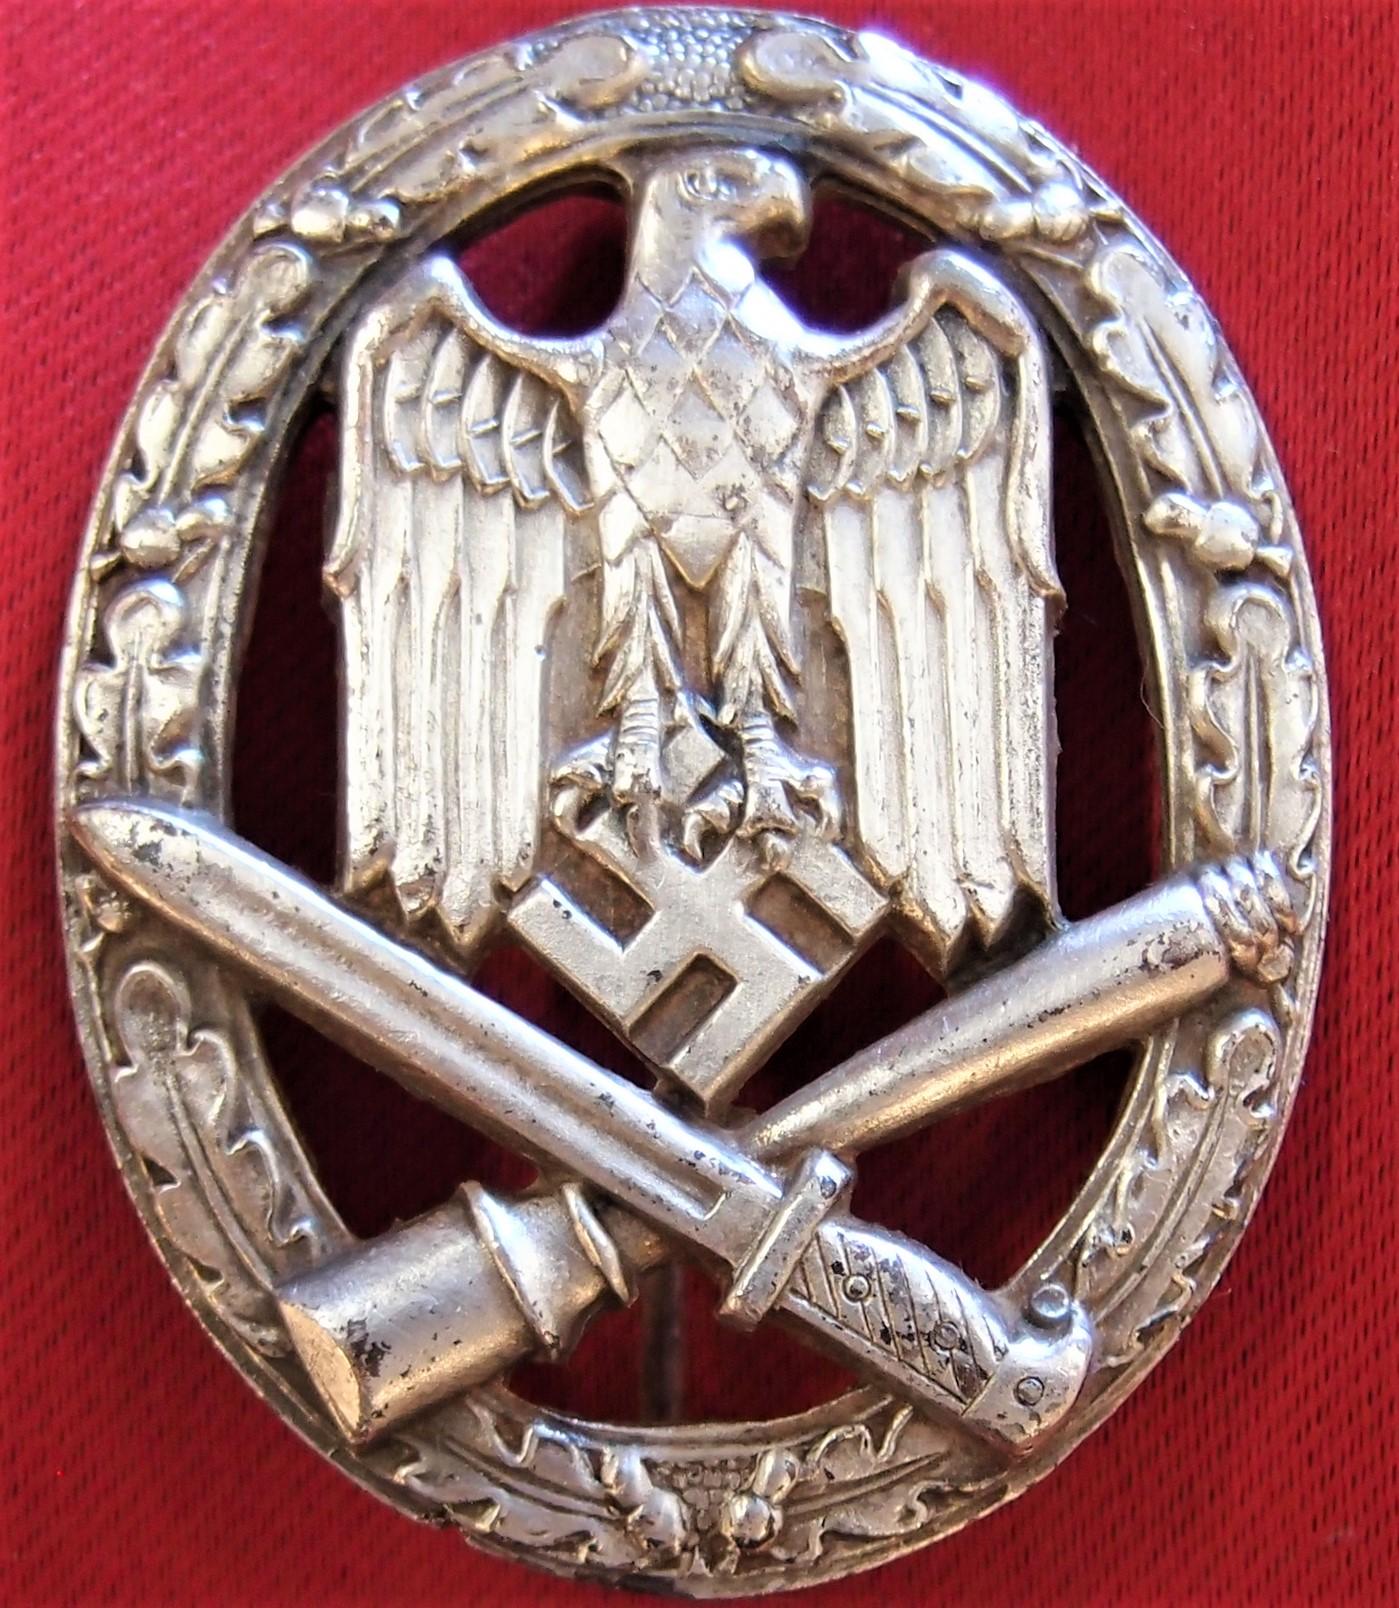 ** SOLD** WW2 NAZI GERMAN ARMY GENERAL ASSAULT BADGE